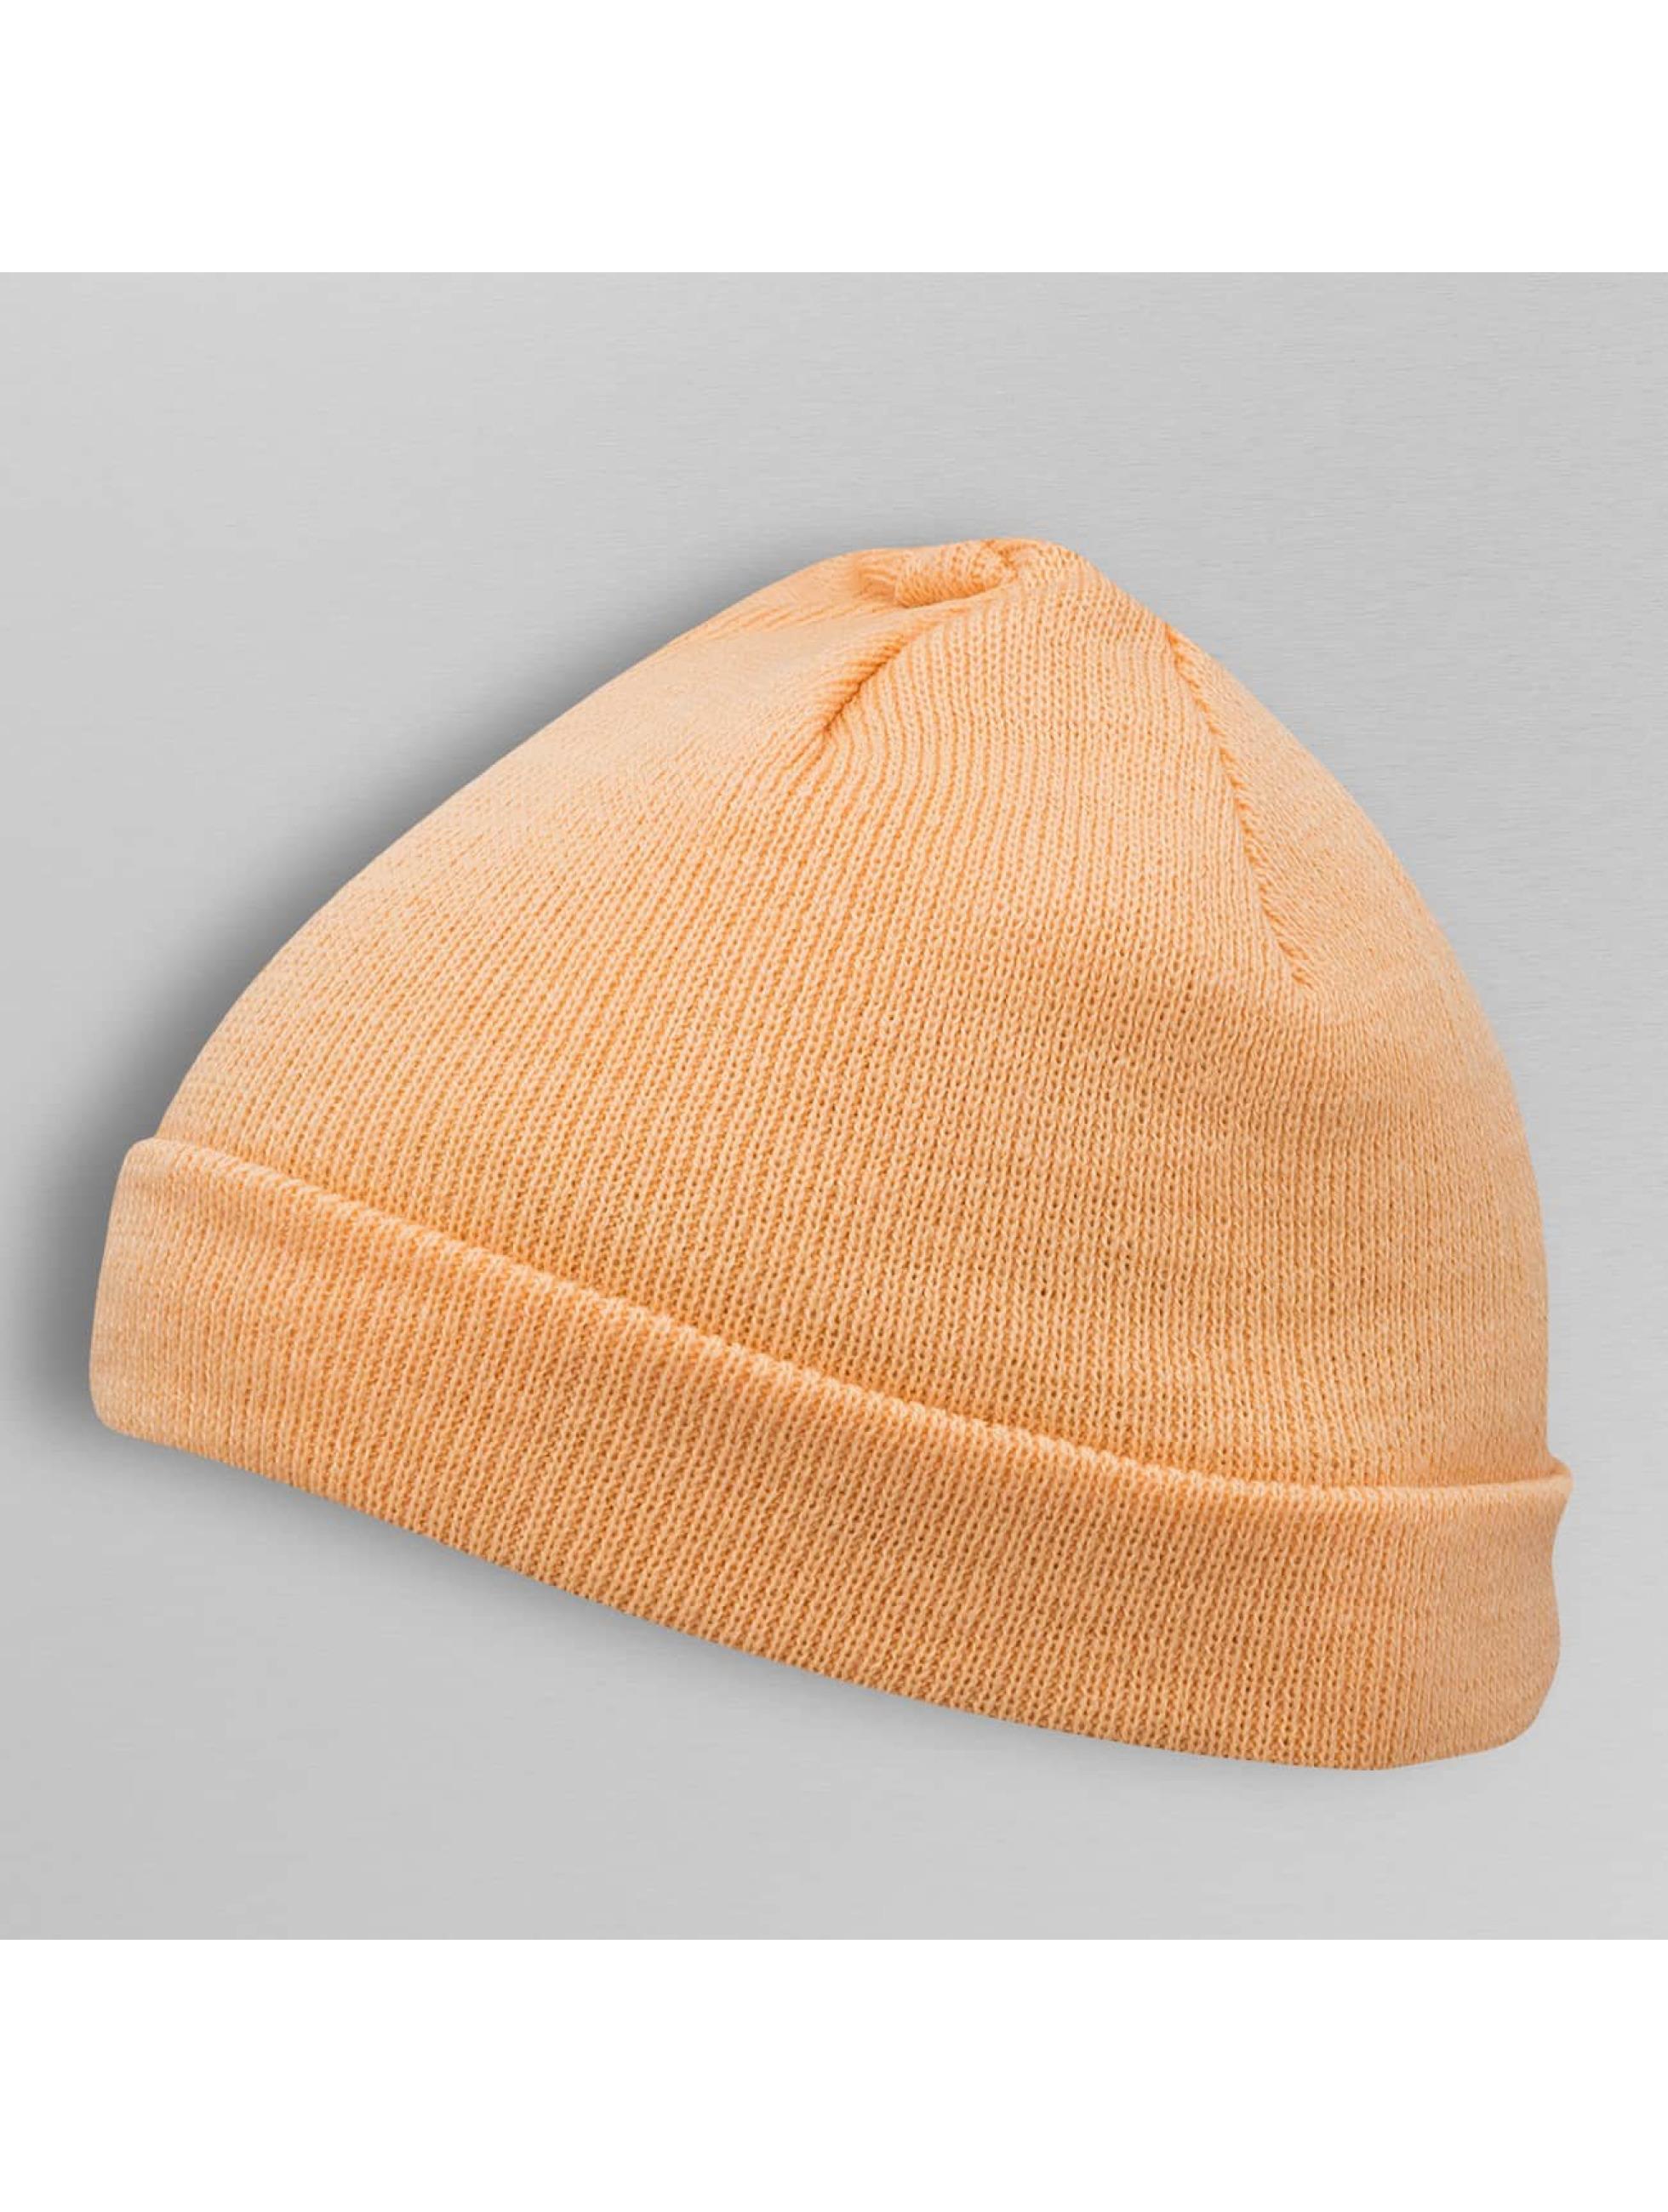 MSTRDS шляпа Short Pastel Cuff Knit оранжевый